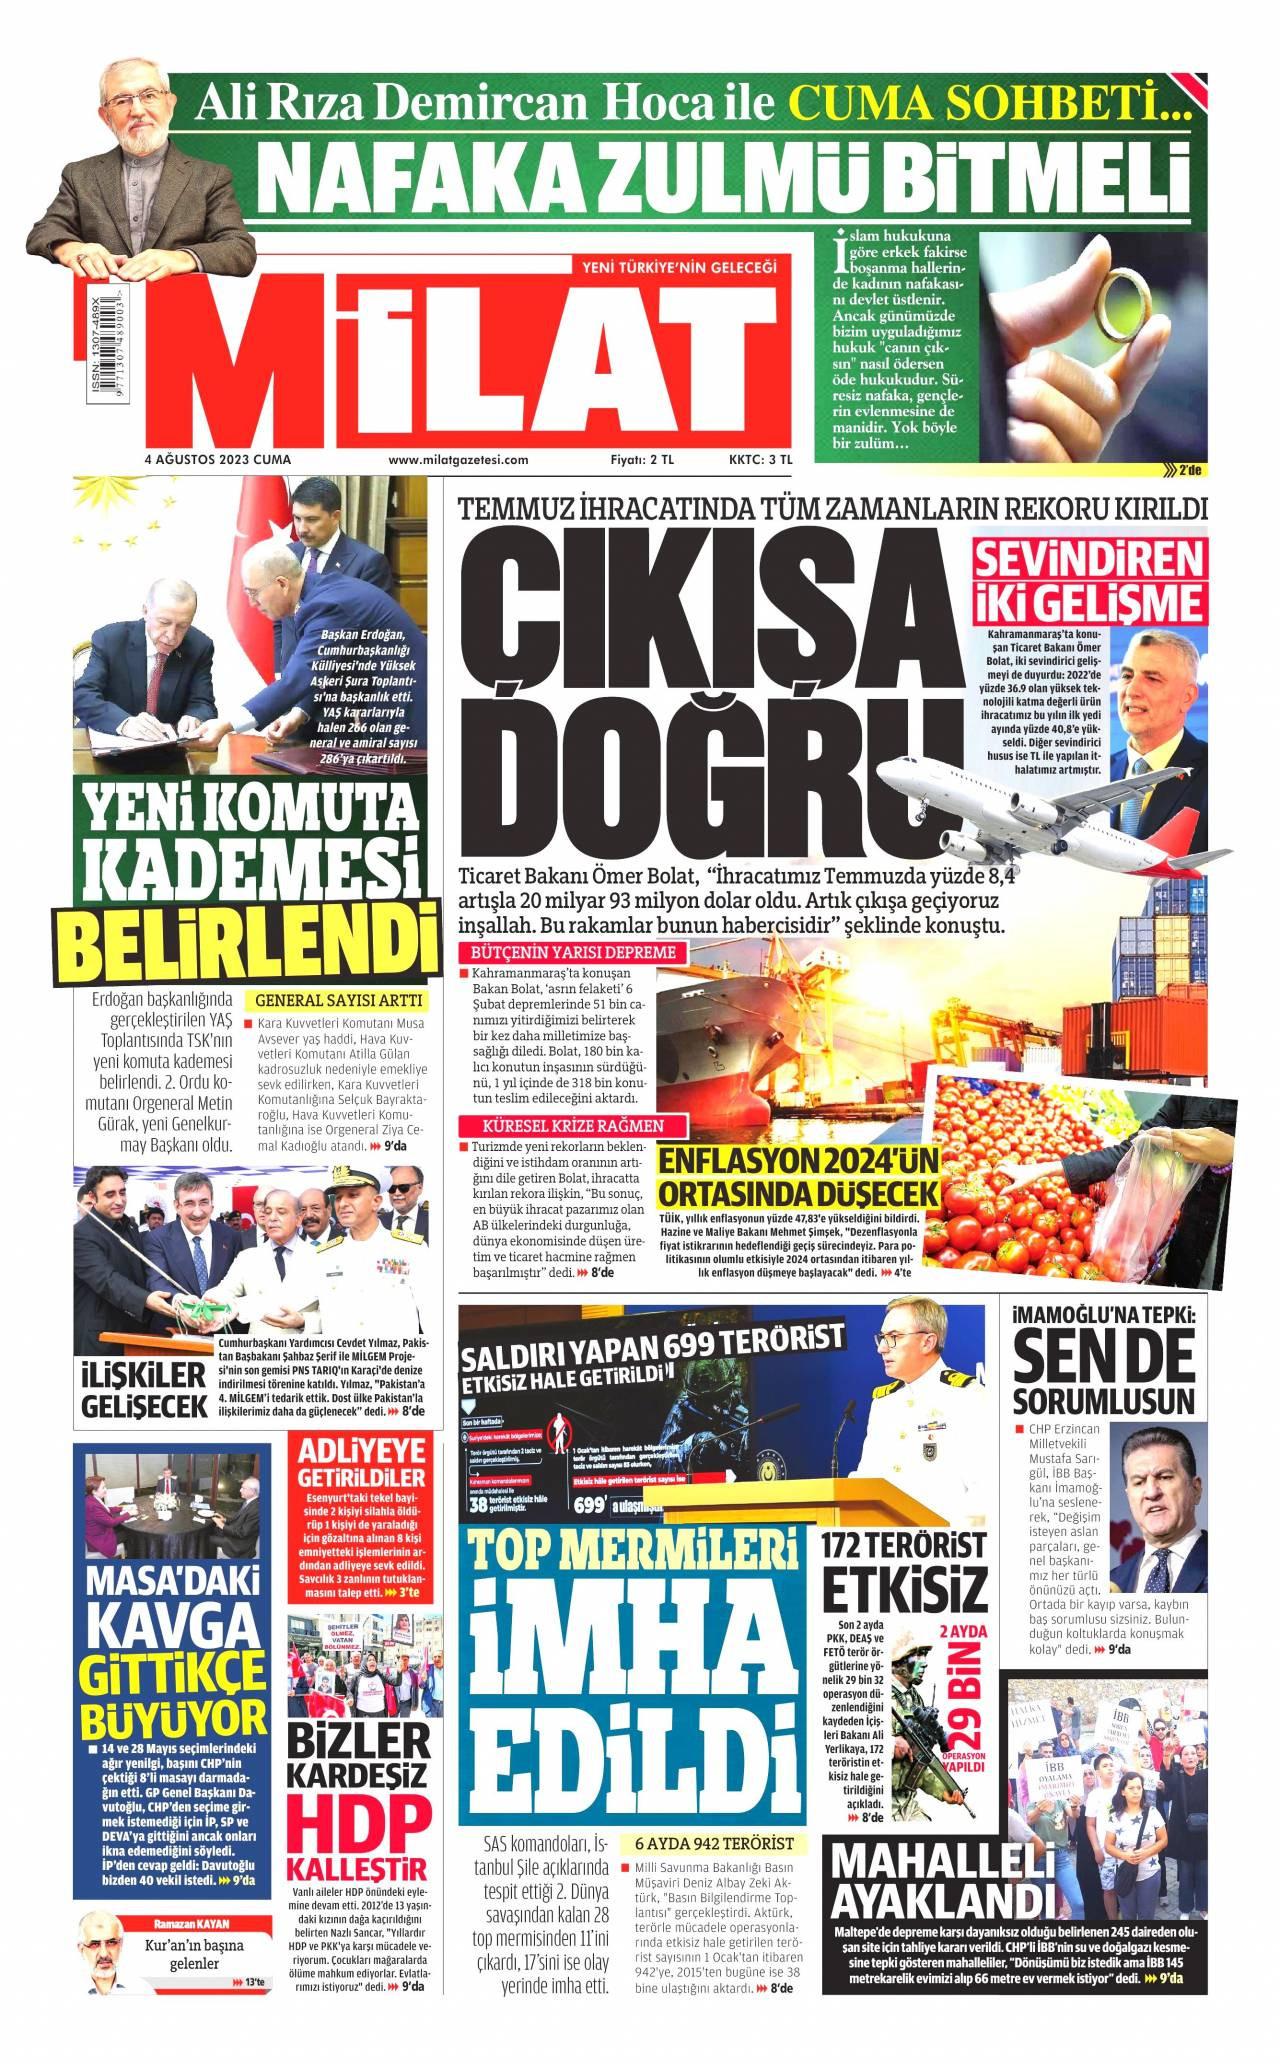 Gazete Manşetleri 1 Mart 2019 Cuma Kdz Ereğli Haber Eregli Fm